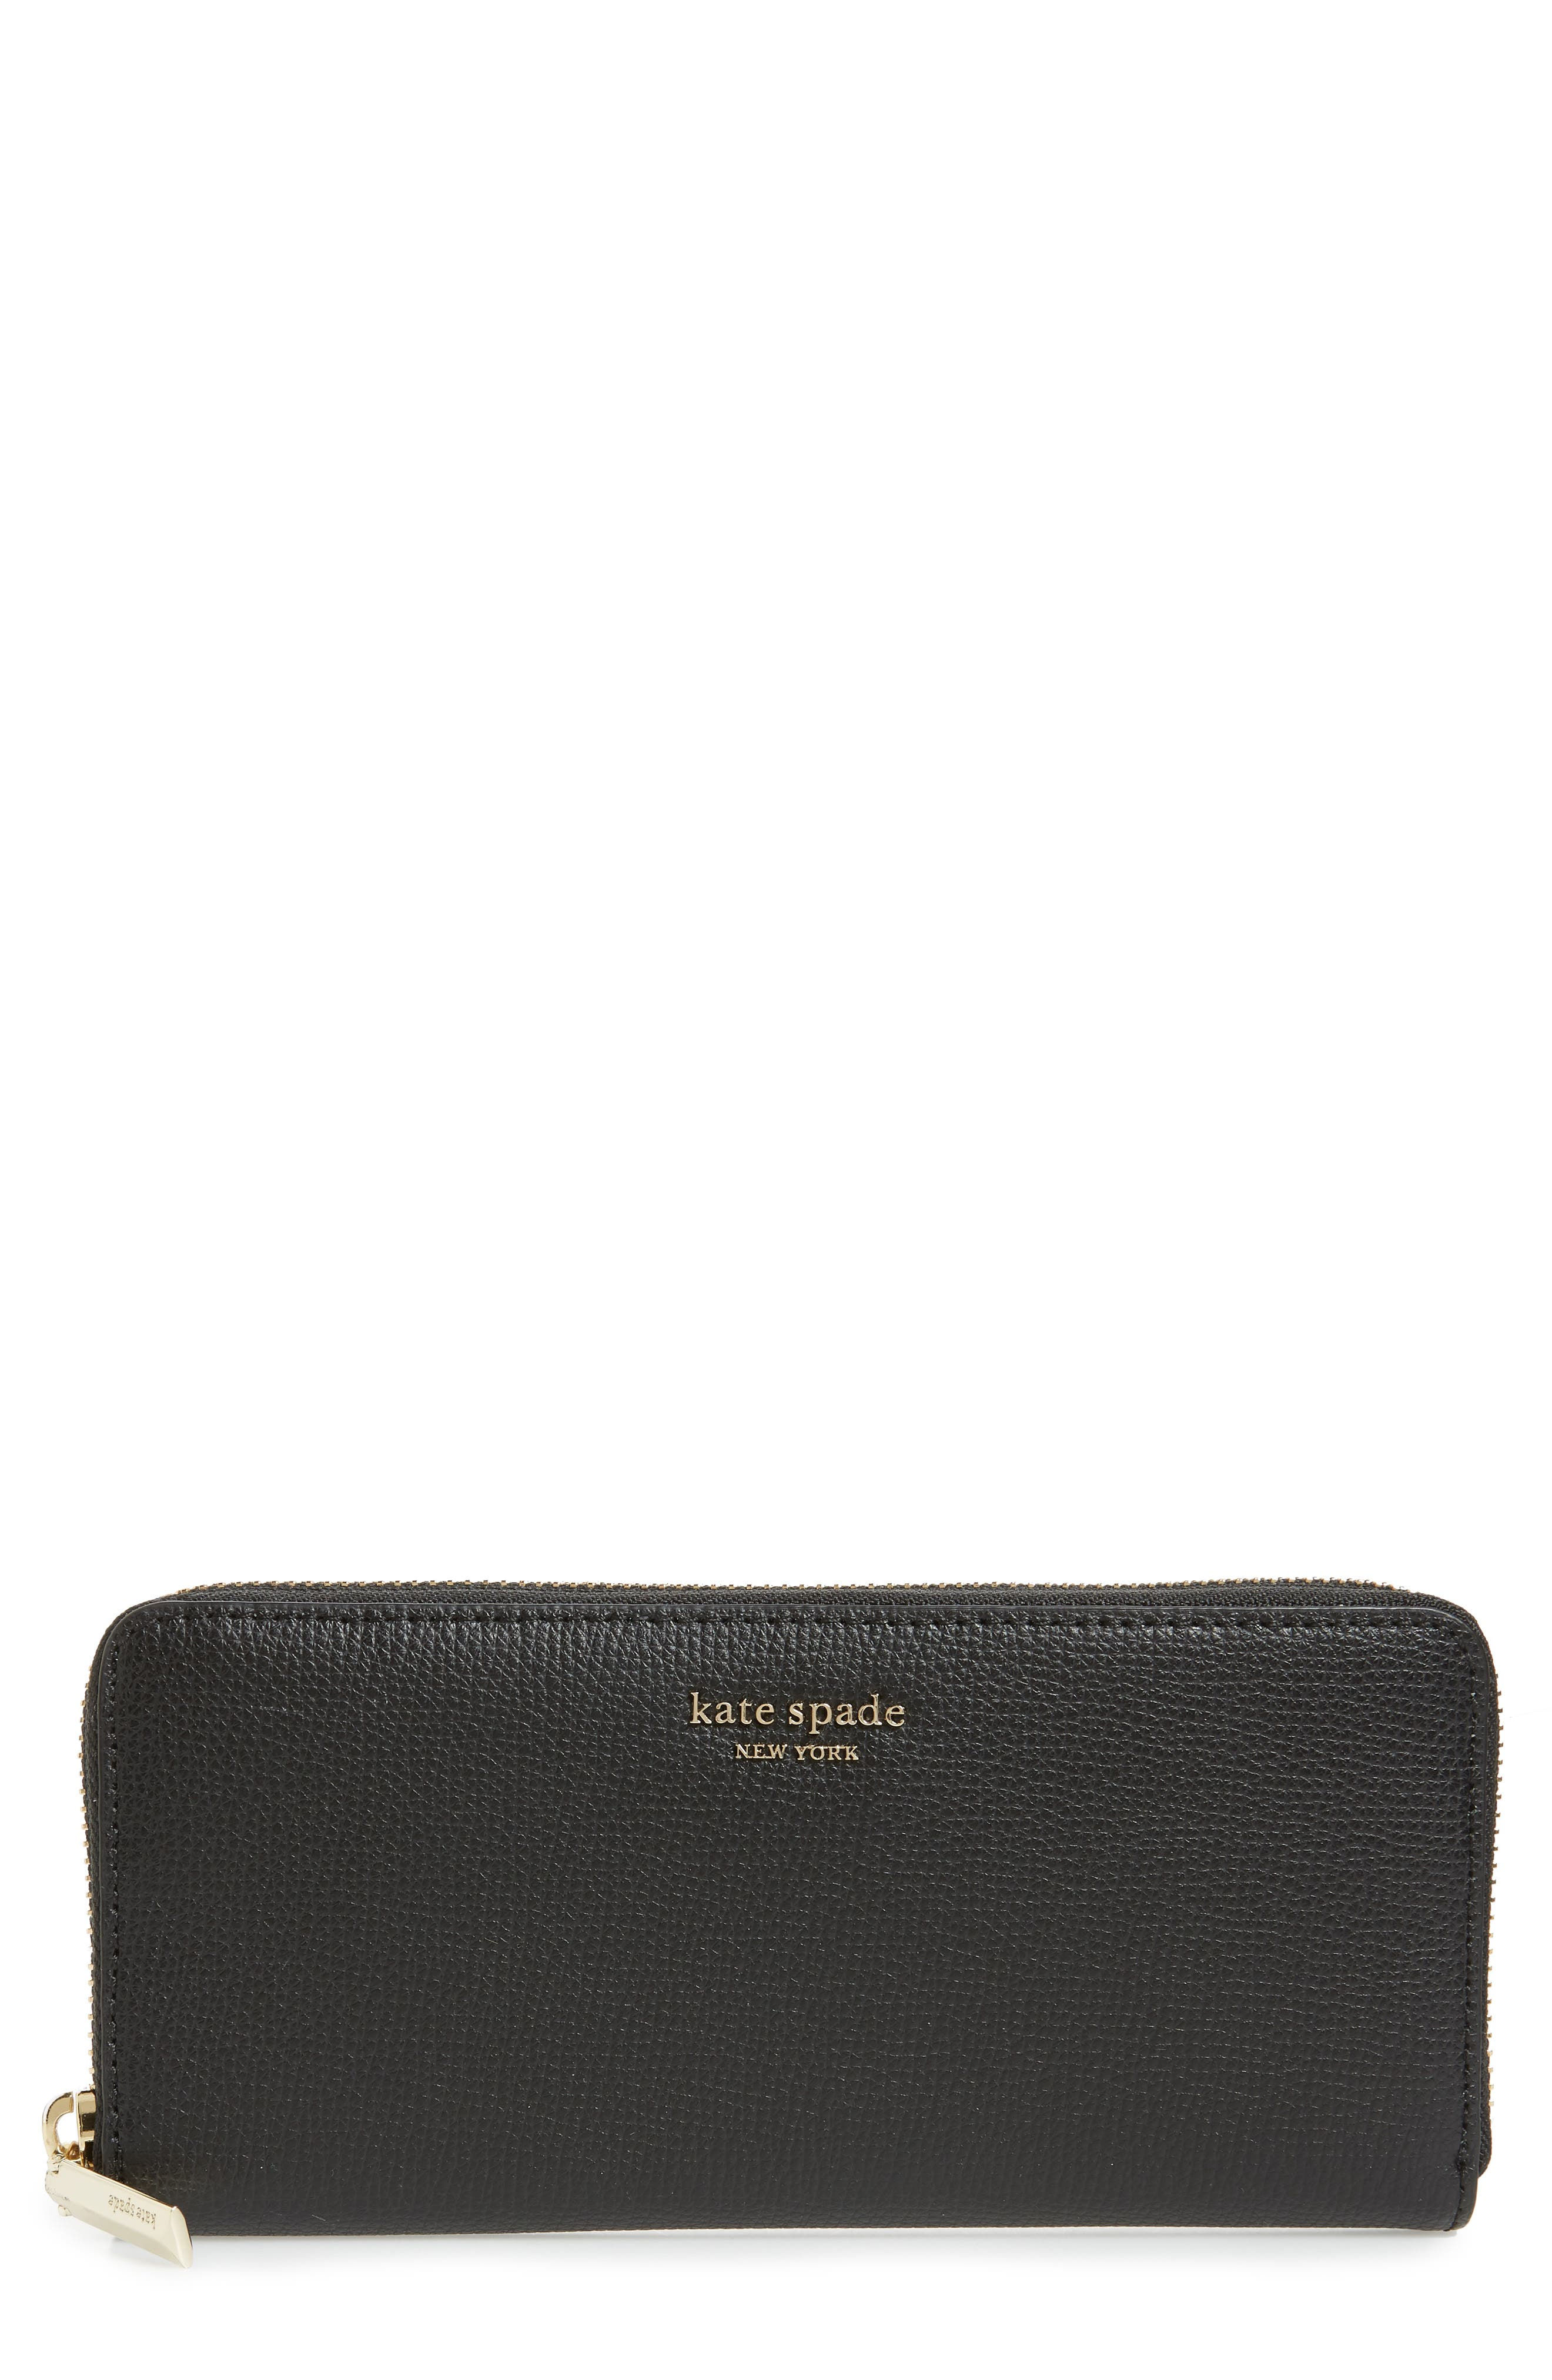 KATE SPADE NEW YORK sylvia slim continental wallet, Main, color, BLACK